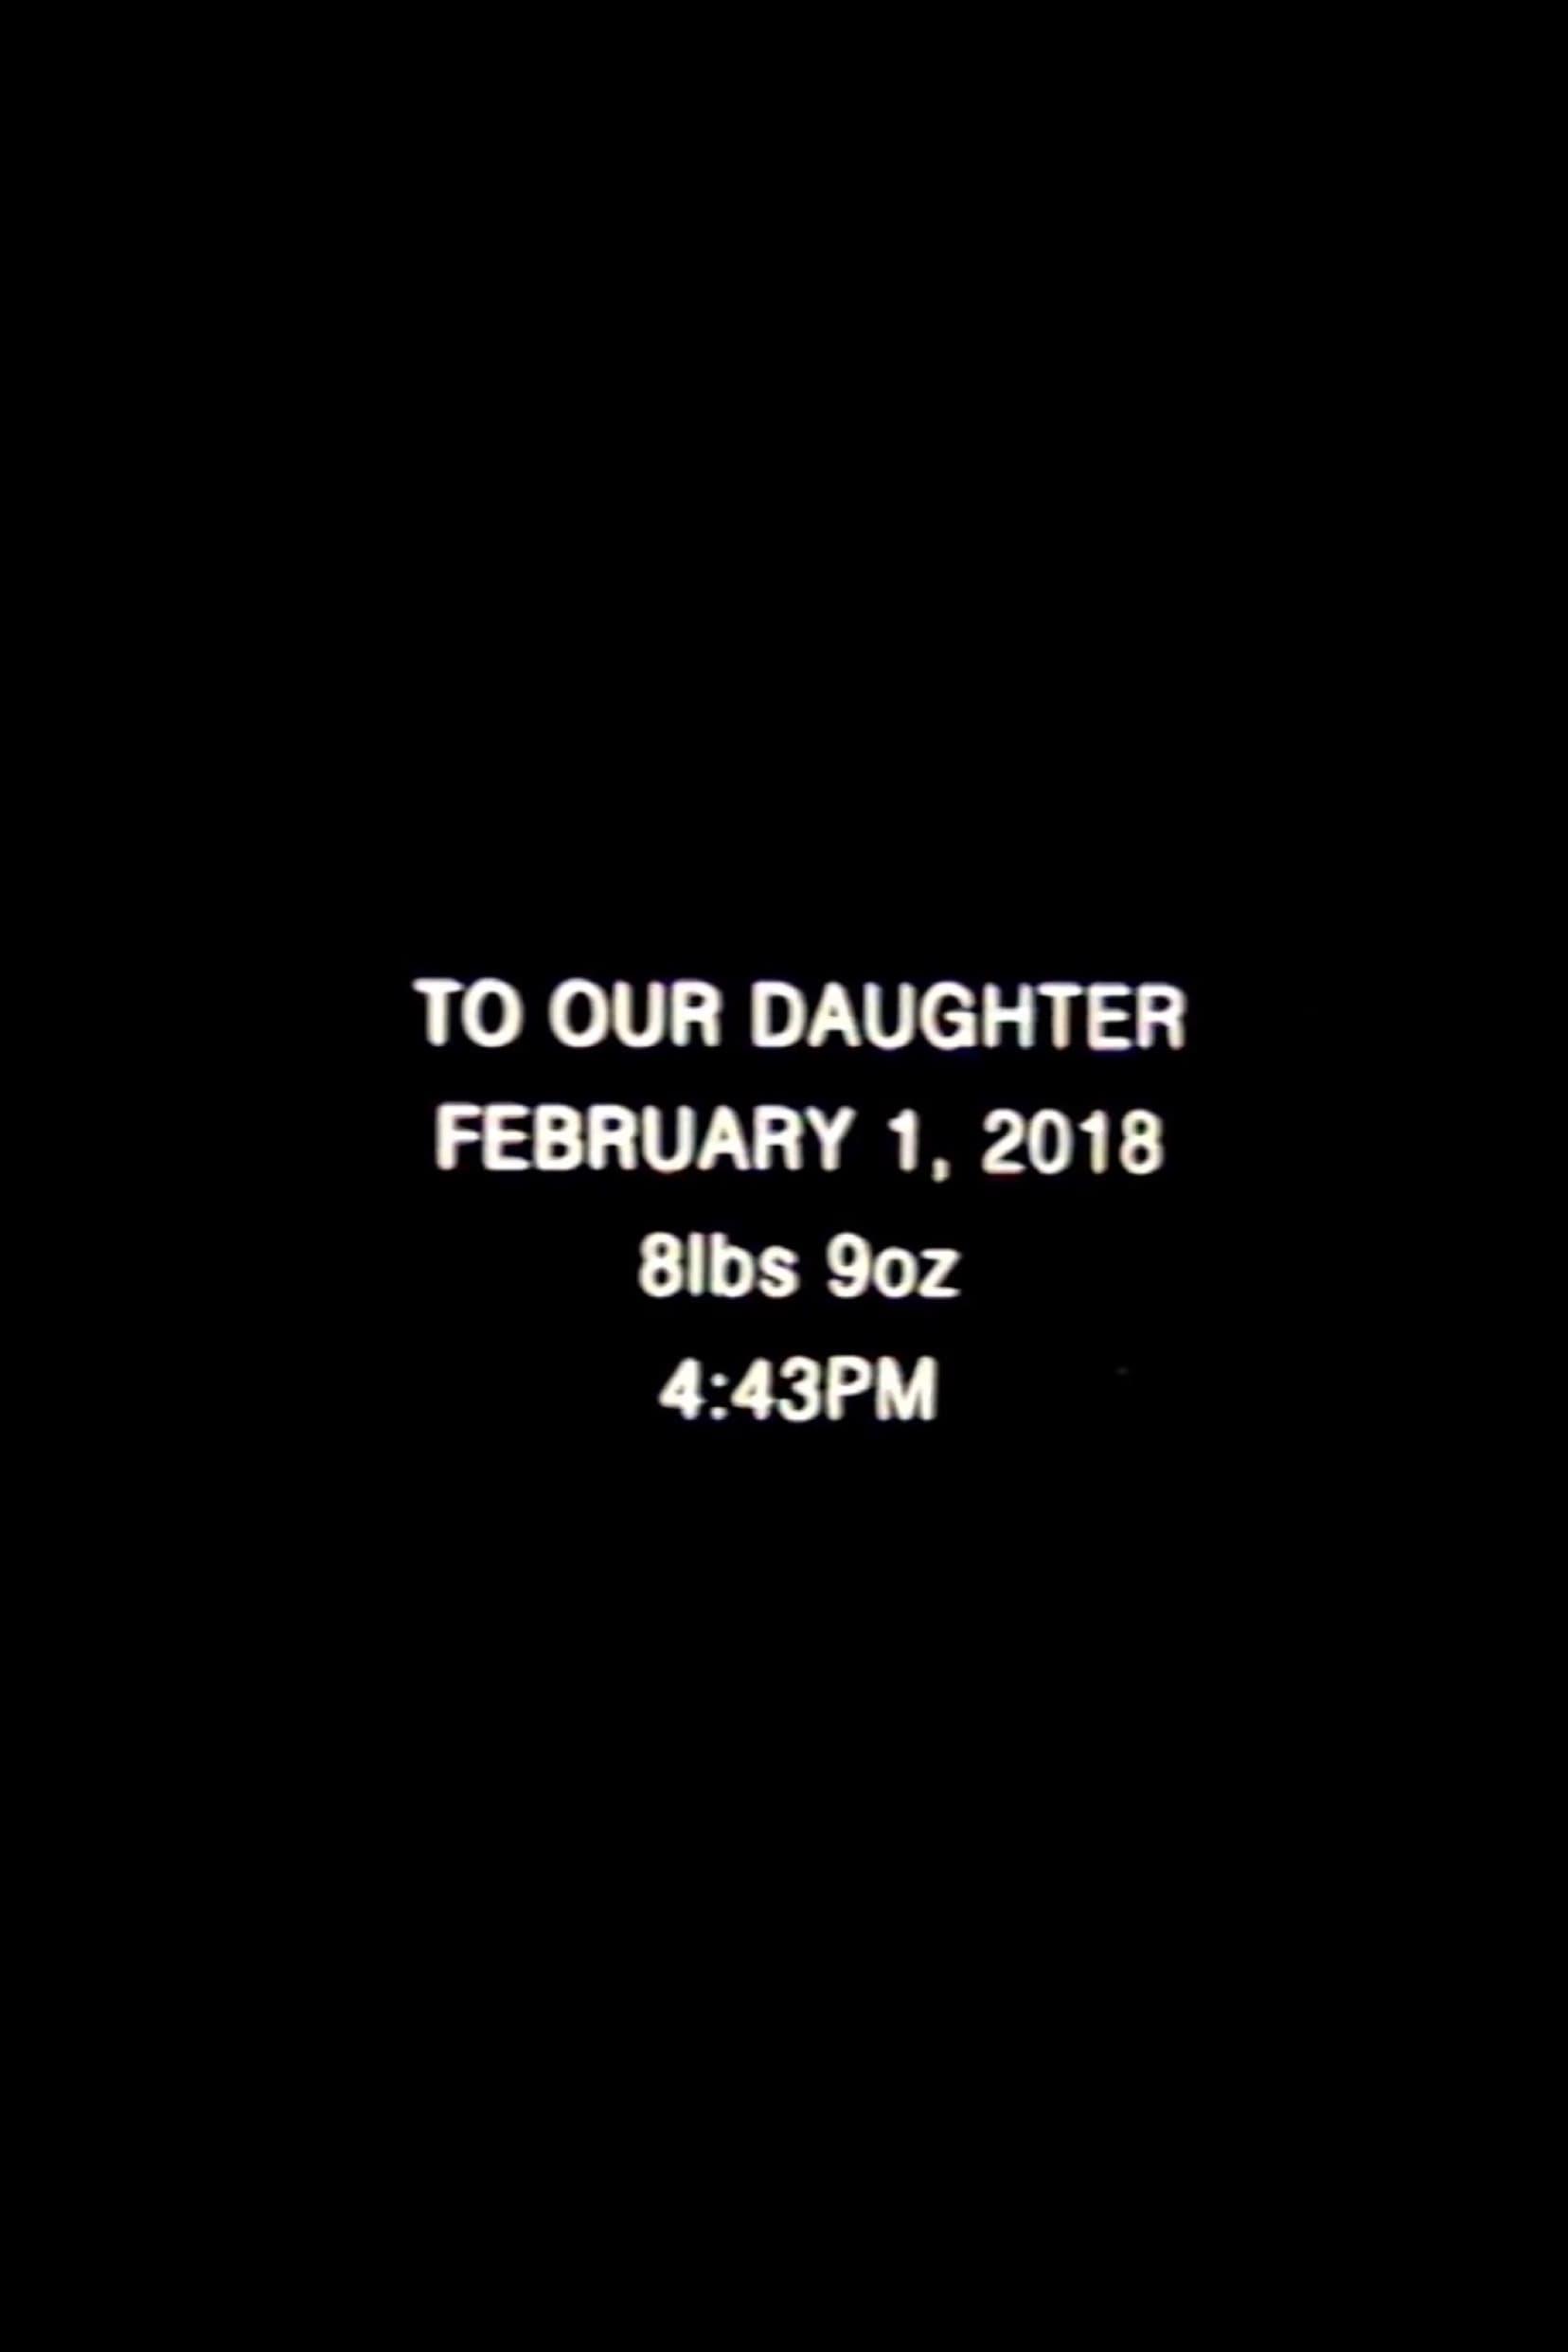 Para Nuestra Hija